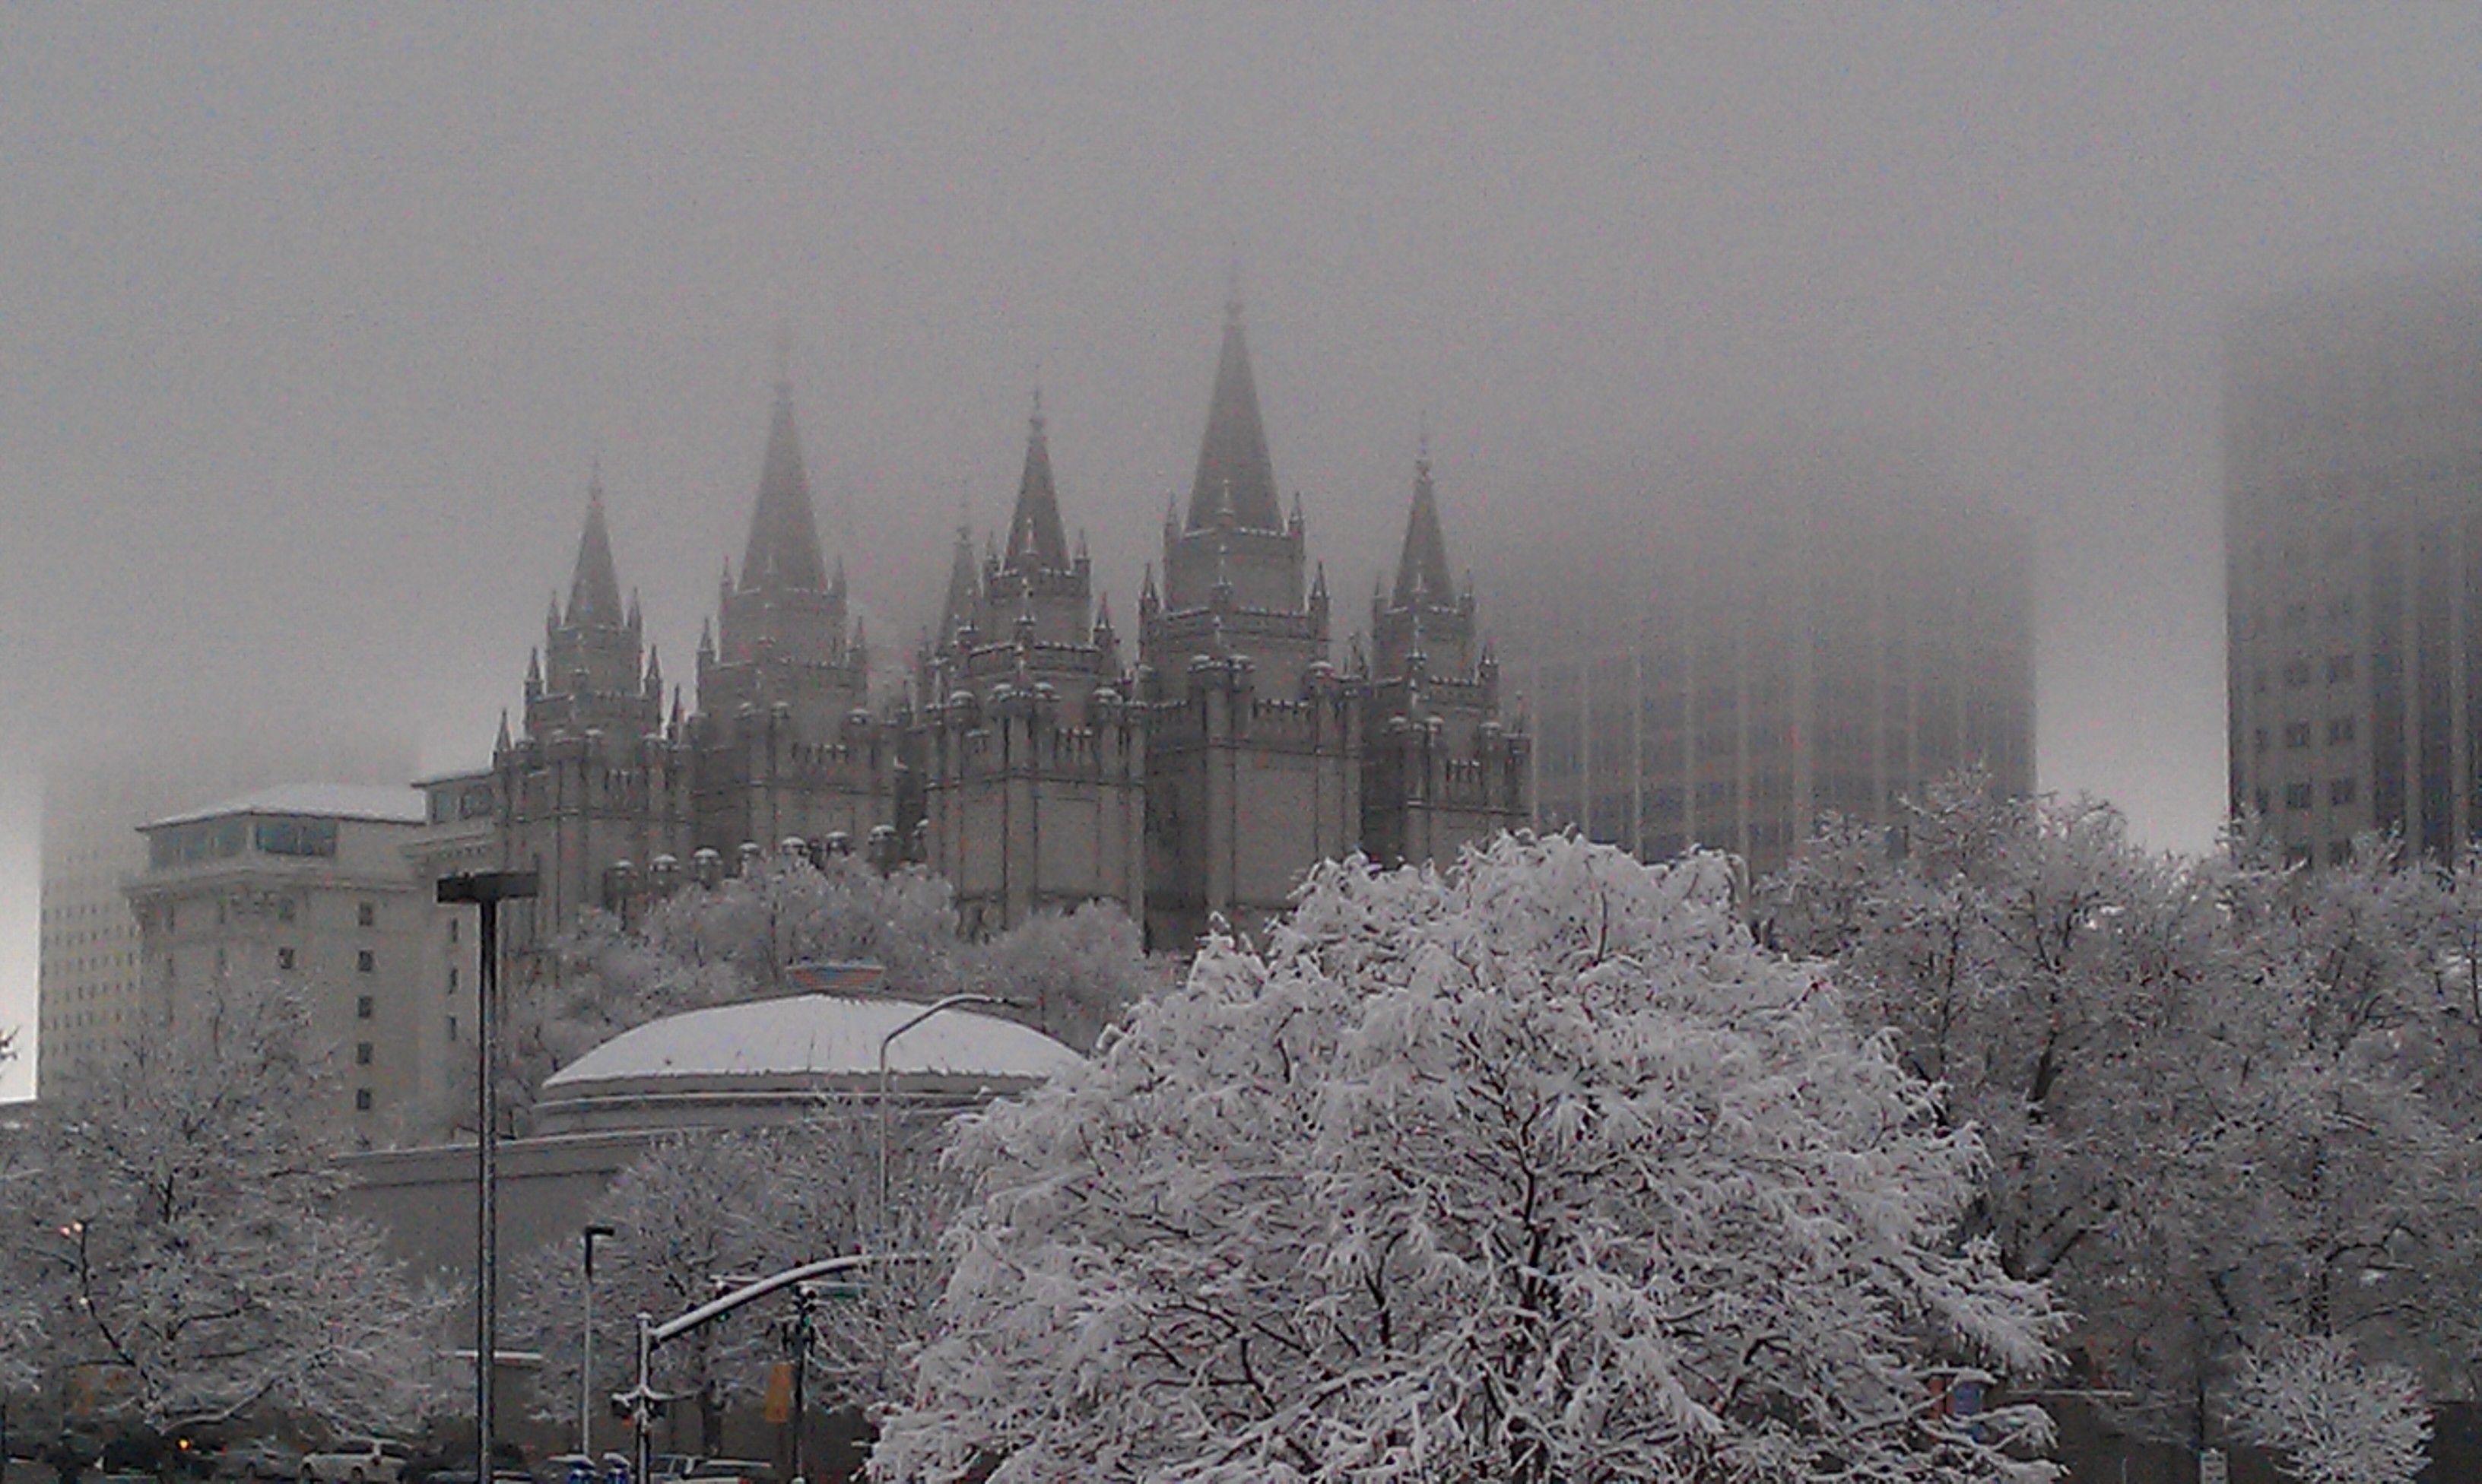 Salt Lake City, Utah Temple on a snowy January morning